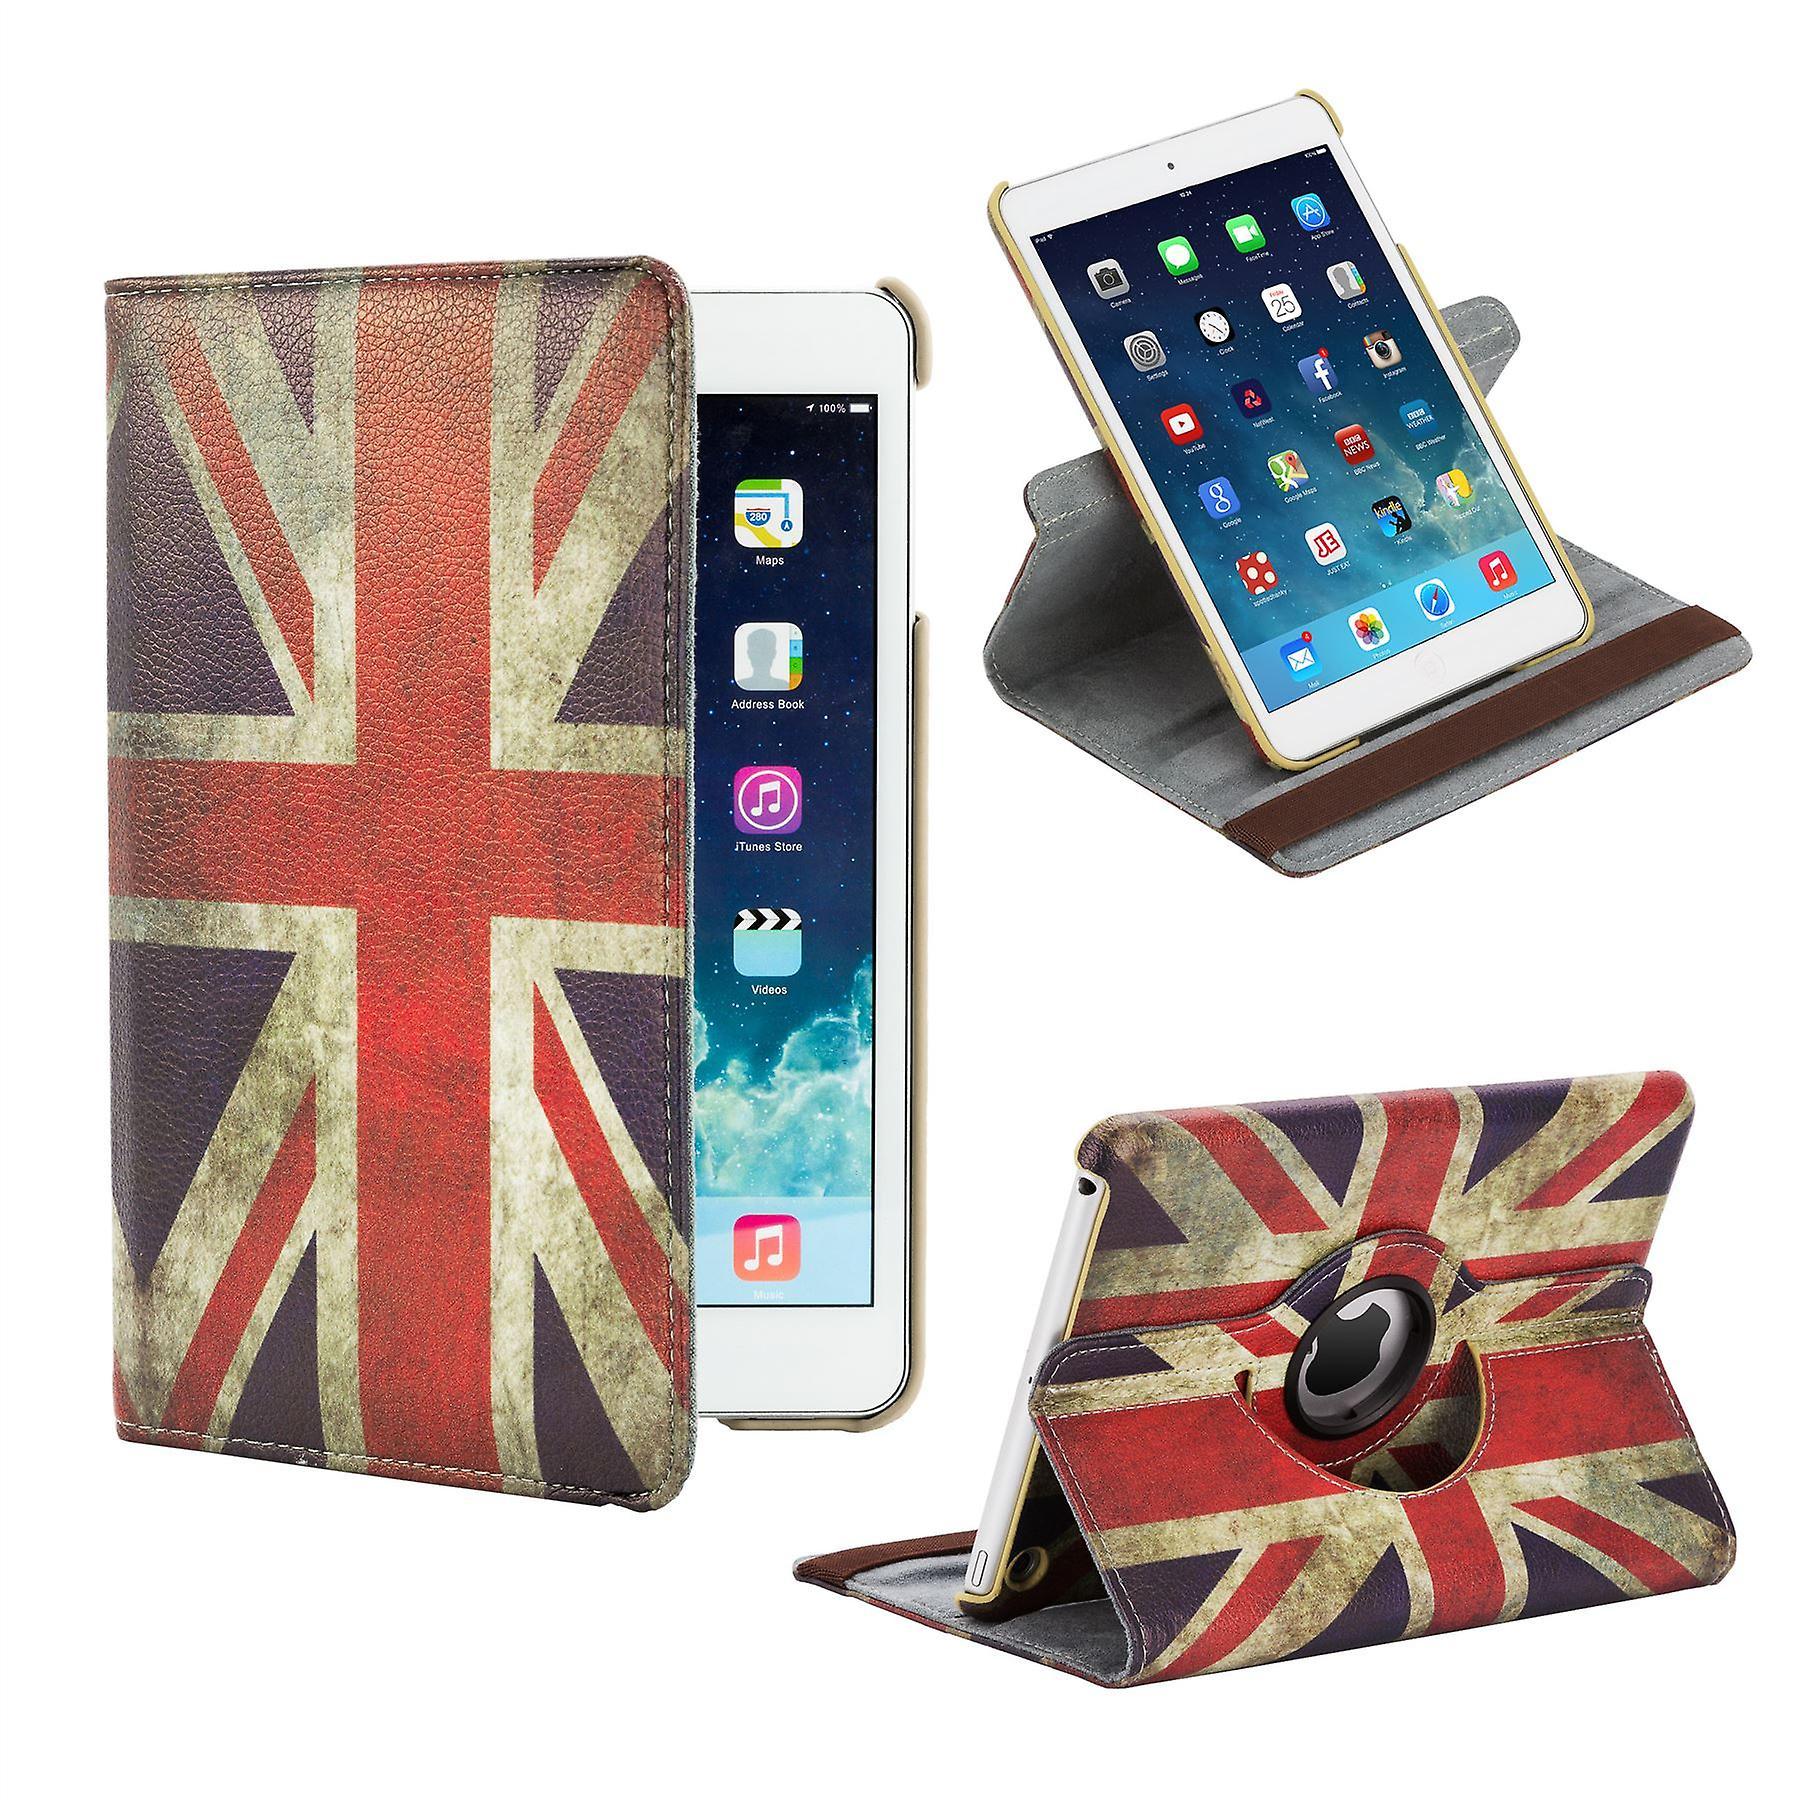 360 degree design case cover for iPad 2/3/4 - Union Jack UK Flag